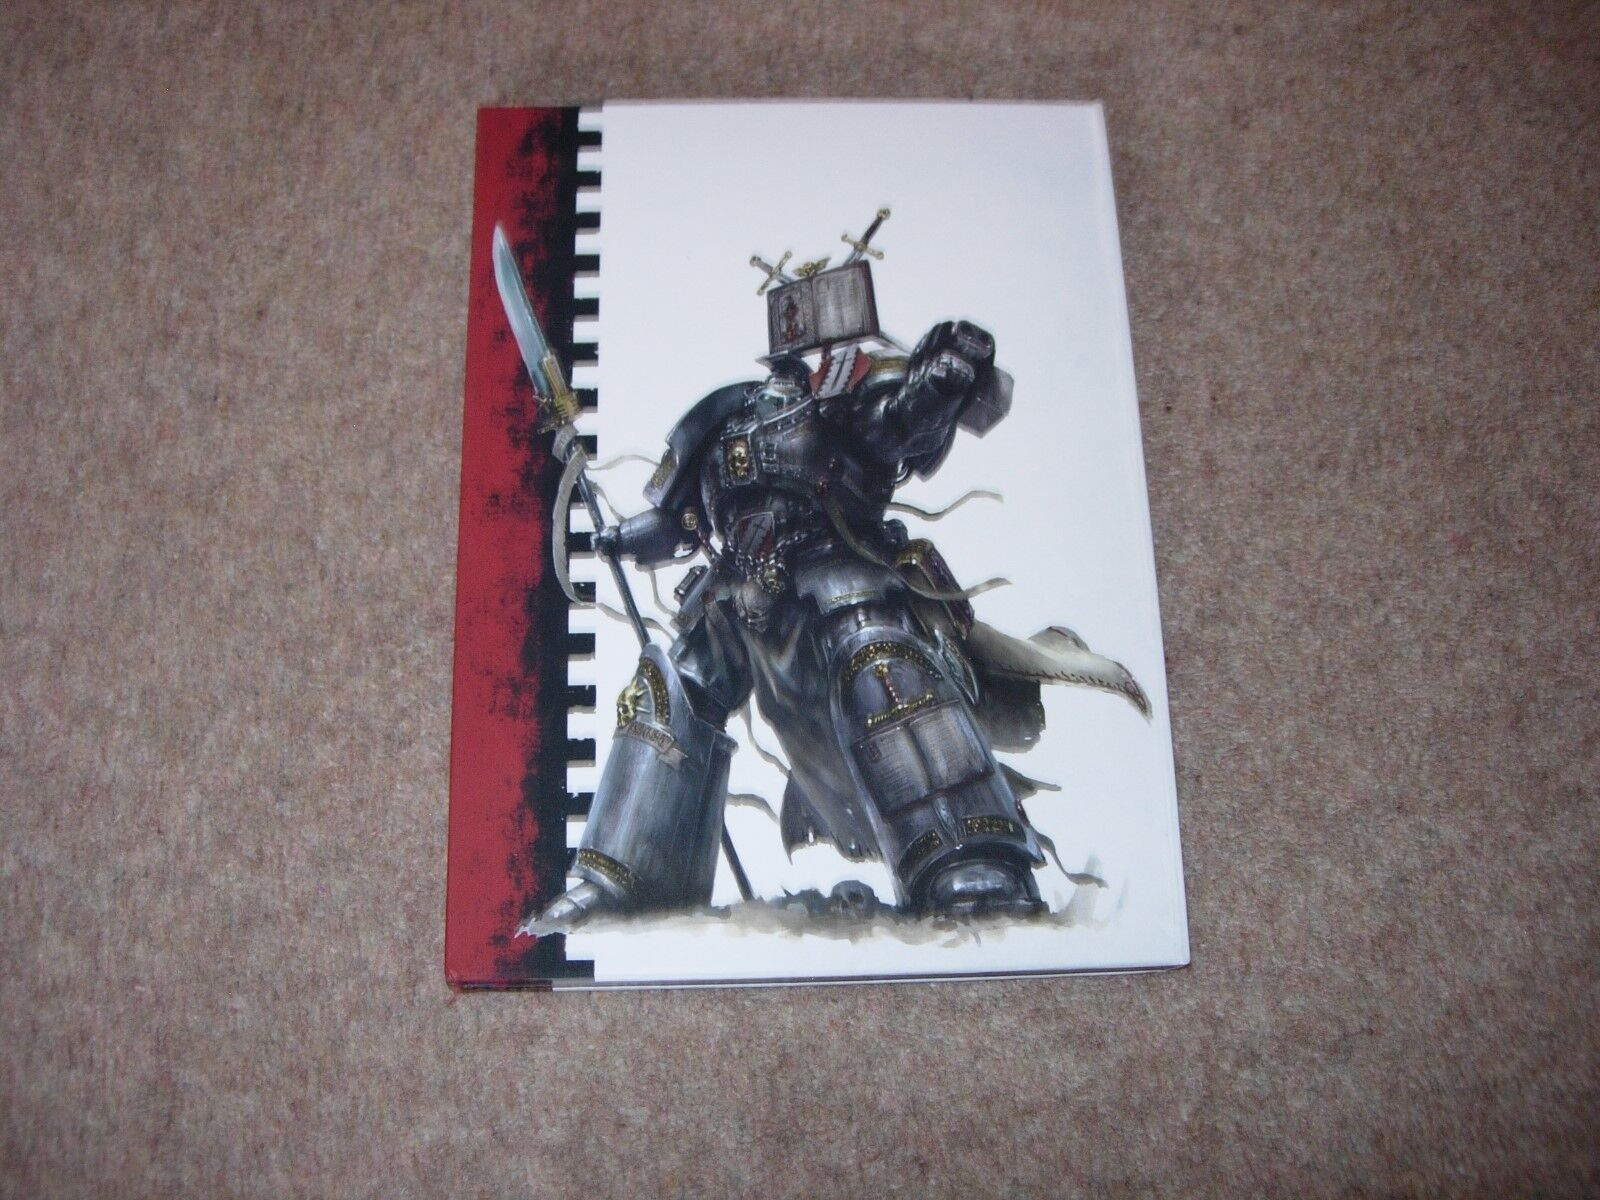 Warhammer 40K Grey Knights Space Marines Limited Collectors Edition Codex